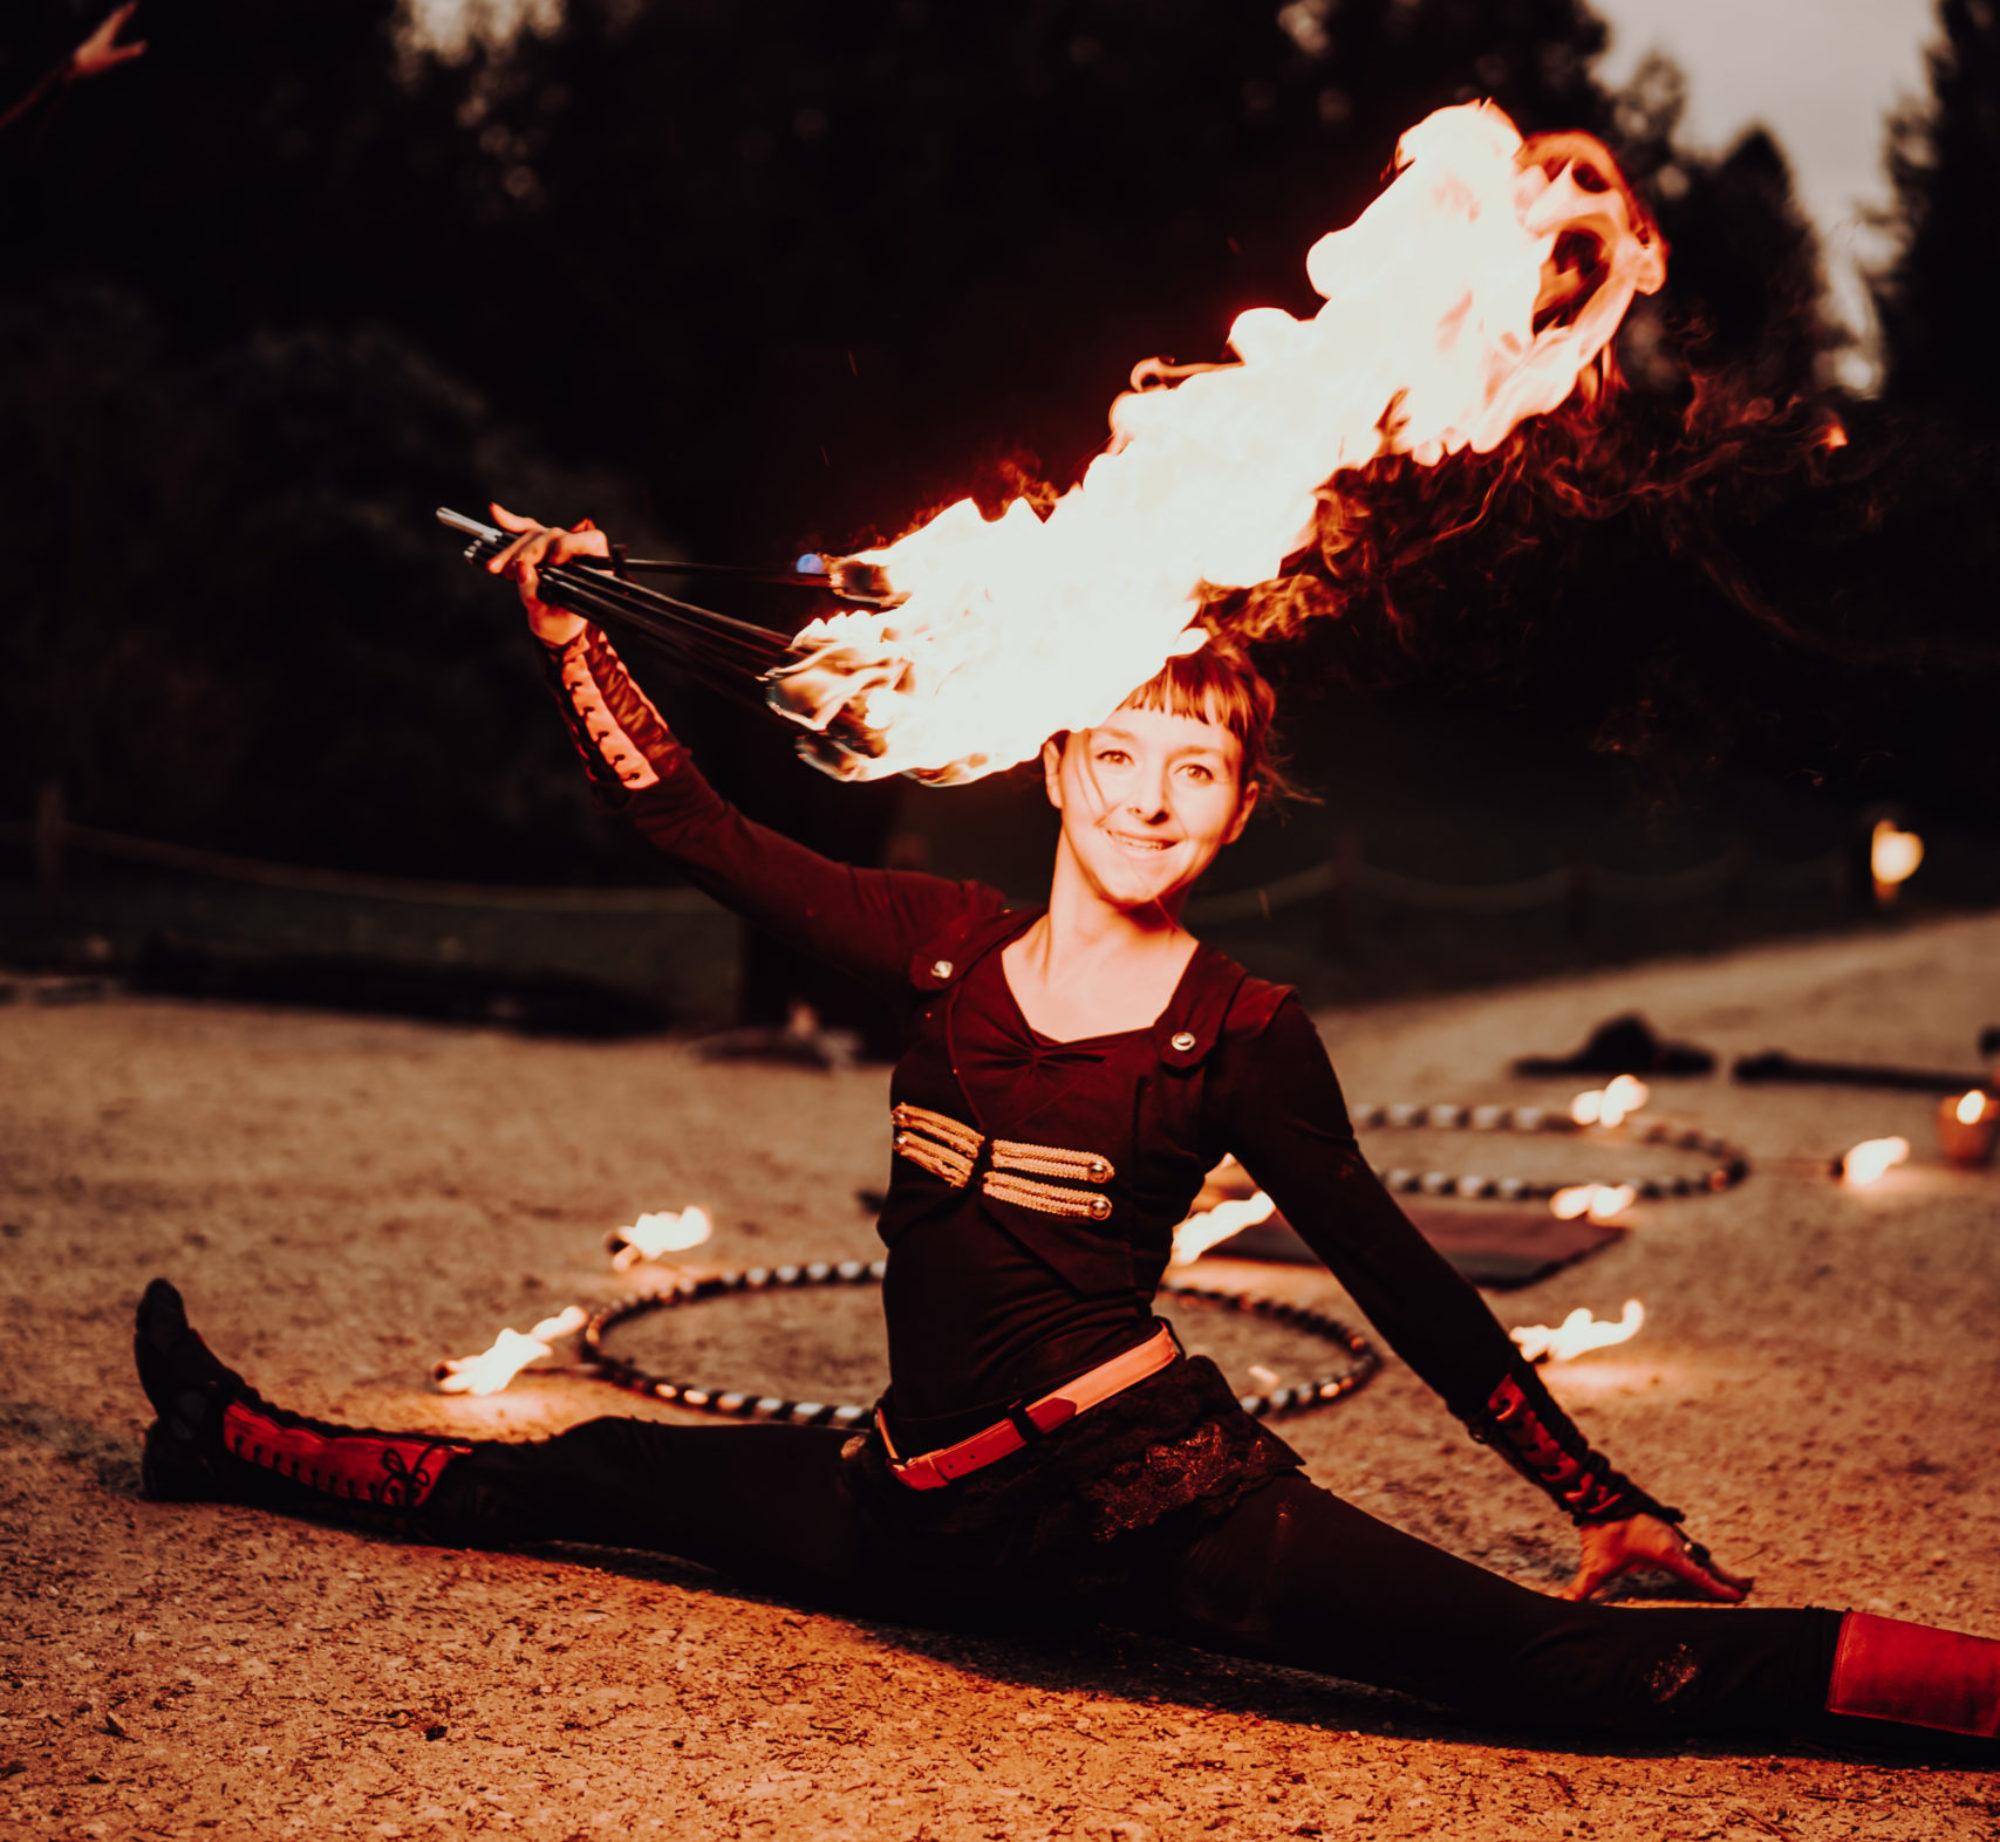 Pandora Feuershow Artistik